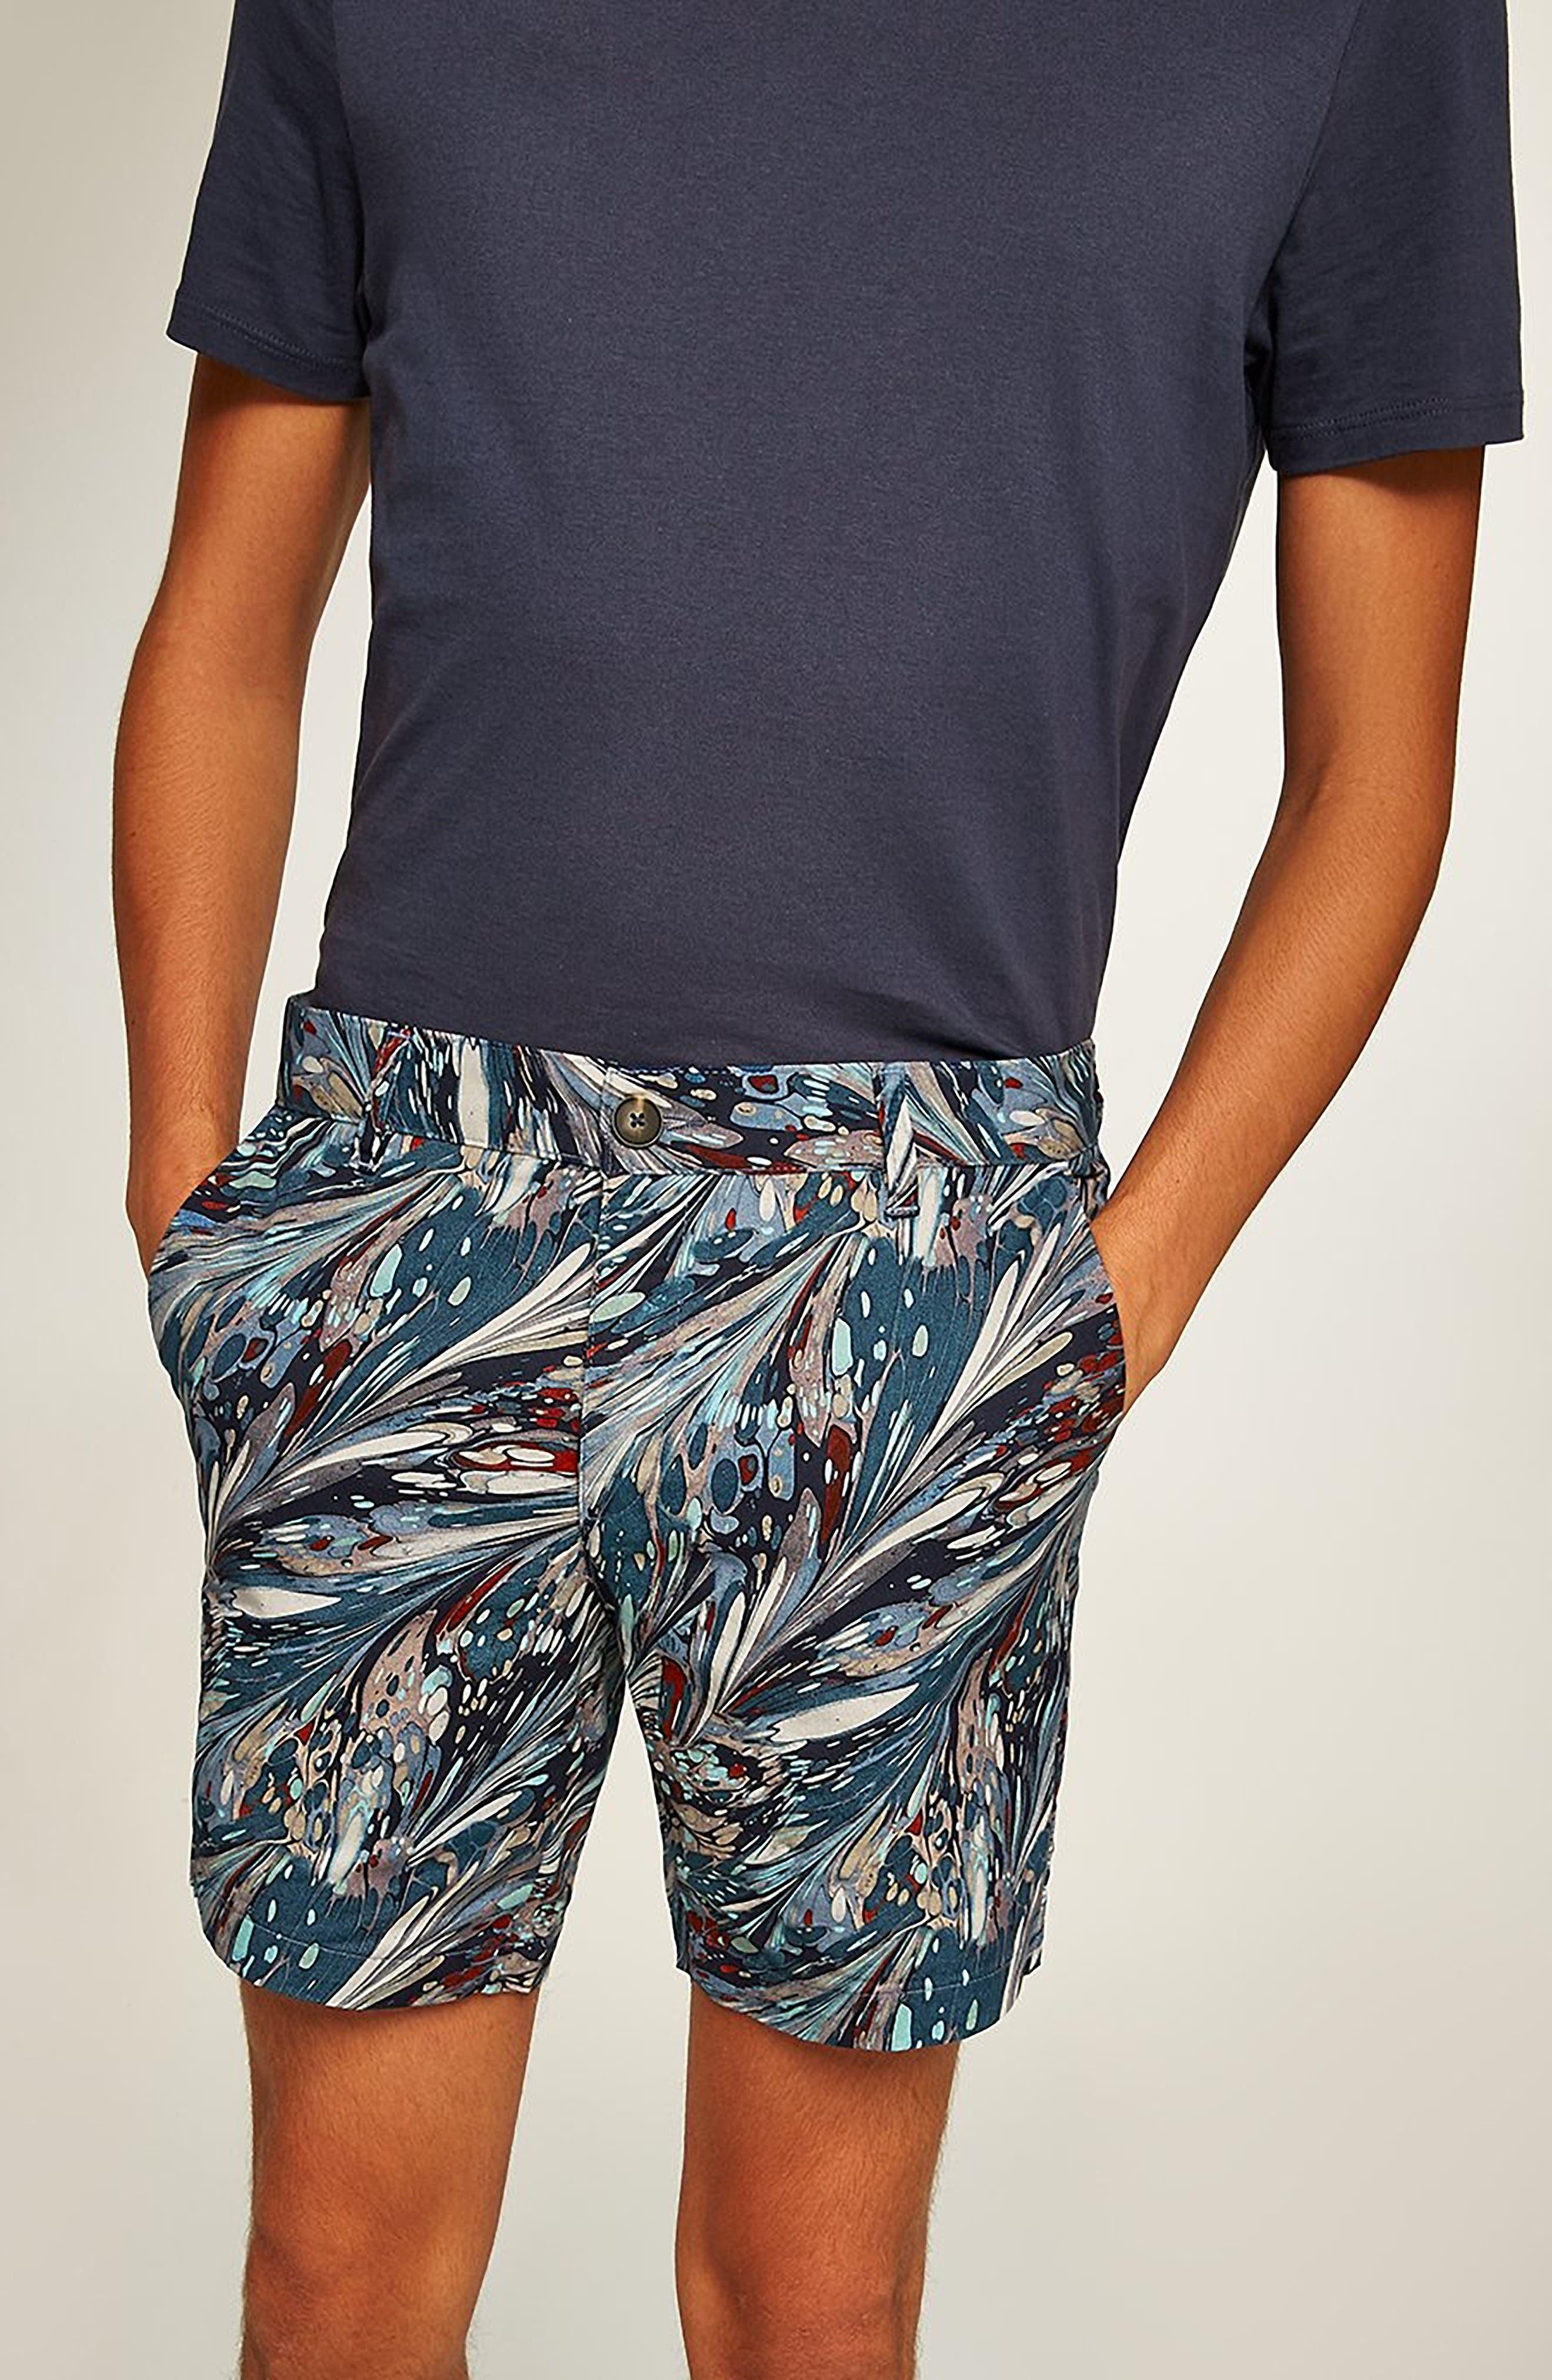 Marble Print Shorts,                             Alternate thumbnail 4, color,                             BLUE